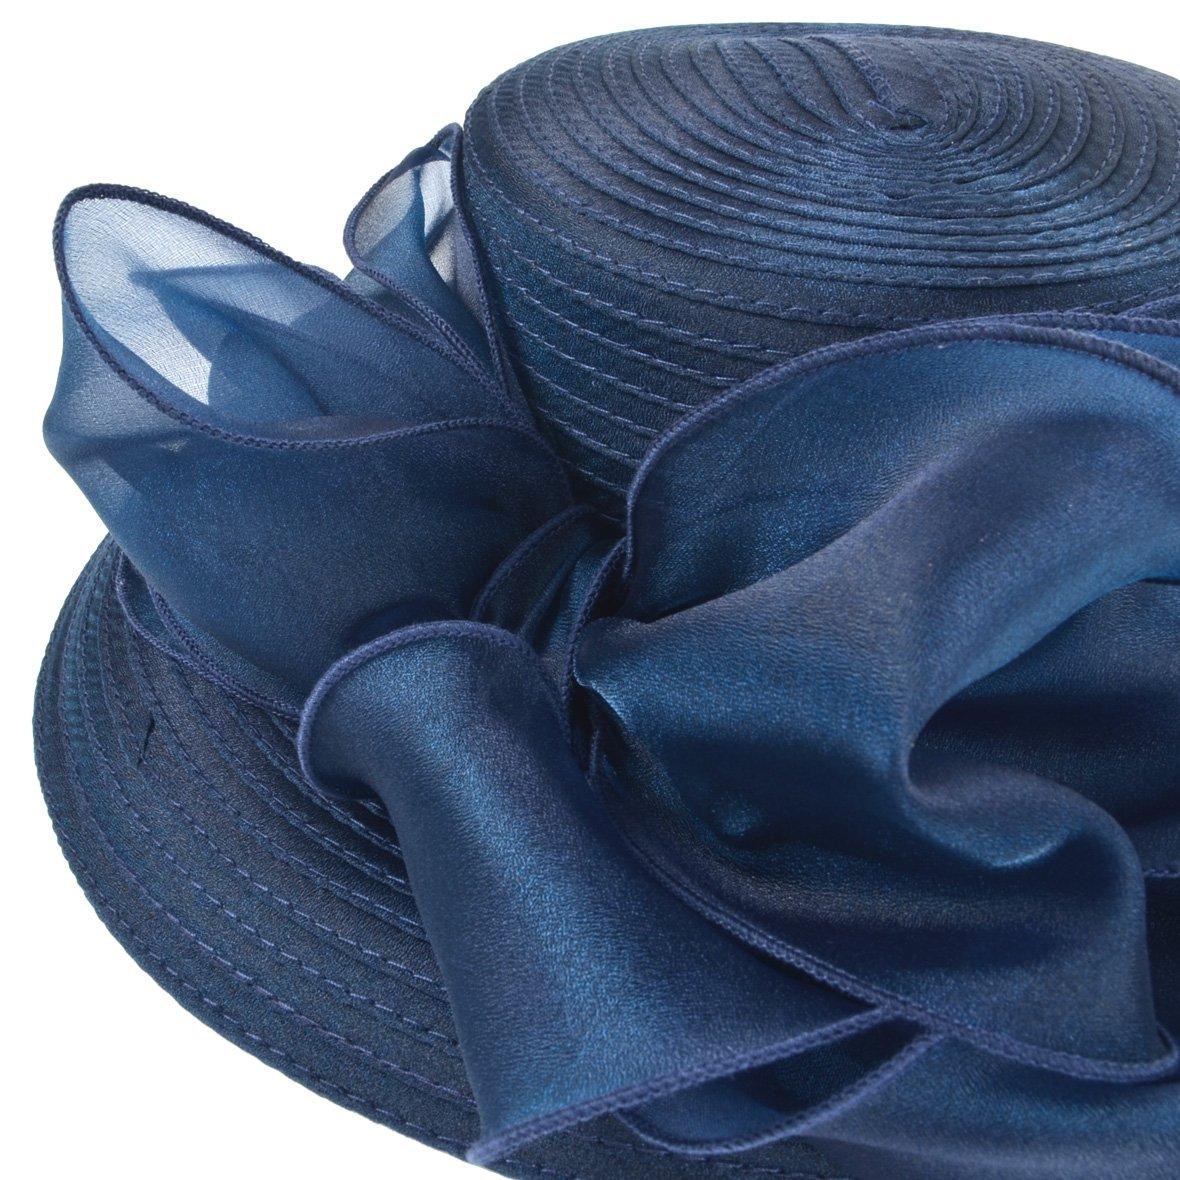 Women Kentucky Derby Church Dress Cloche Hat Fascinator Floral Tea Party Wedding Bucket Hat S052 (S062-Navy) by Ruphedy (Image #4)